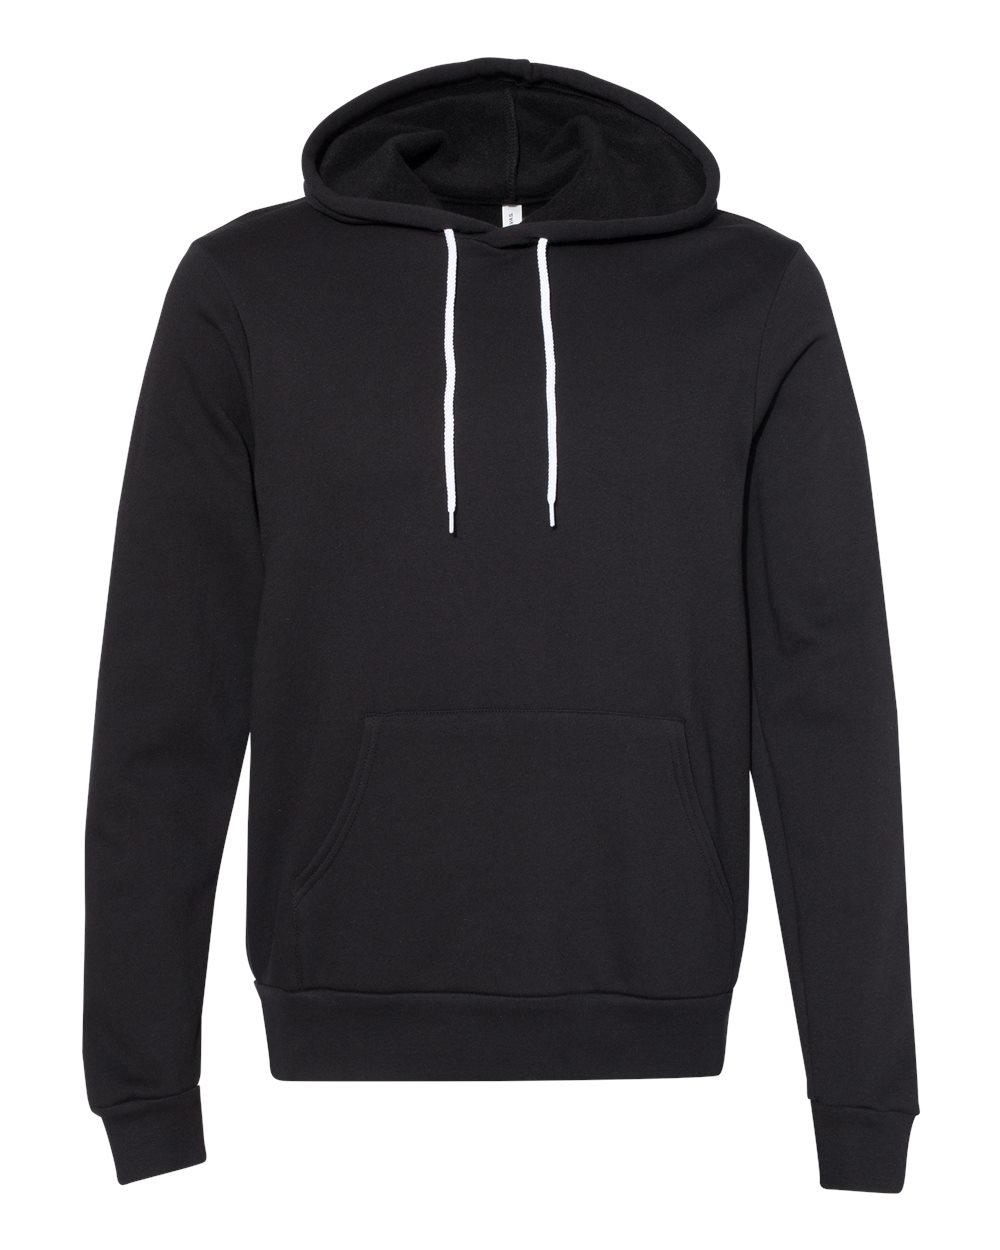 Bella-Canvas-Unisex-Sponge-Hooded-Pullover-Sweatshirt-Blank-3719-up-to-2XL thumbnail 28